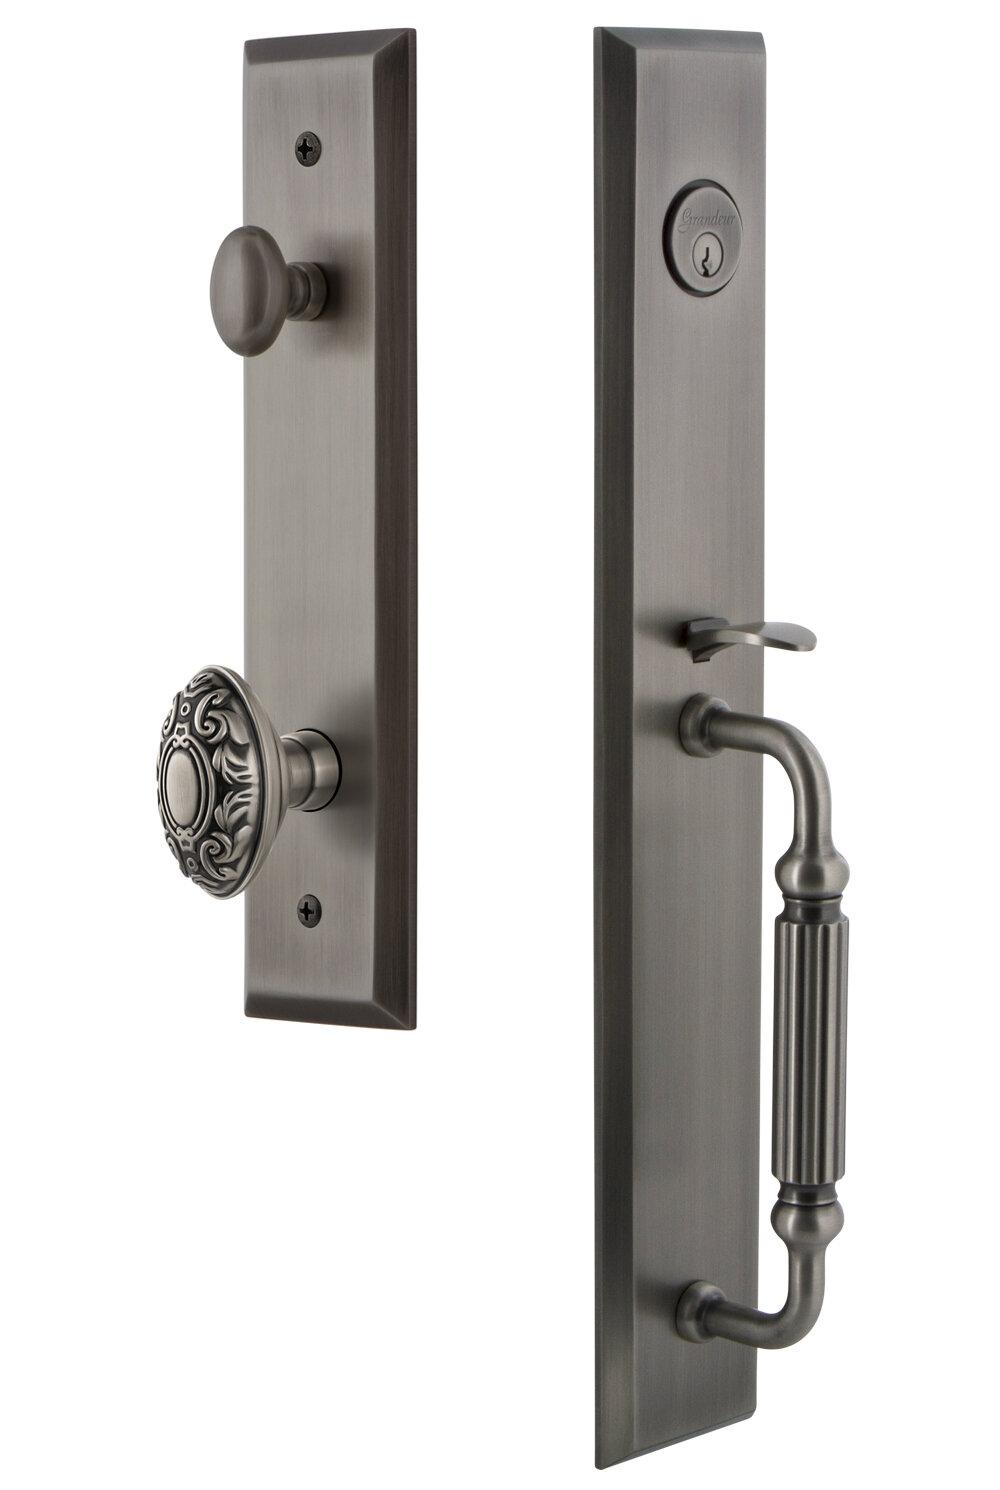 Grandeur Handleset With Single Cylinder Deadbolt And Grande Victorian Door Knob And Rosette Wayfair